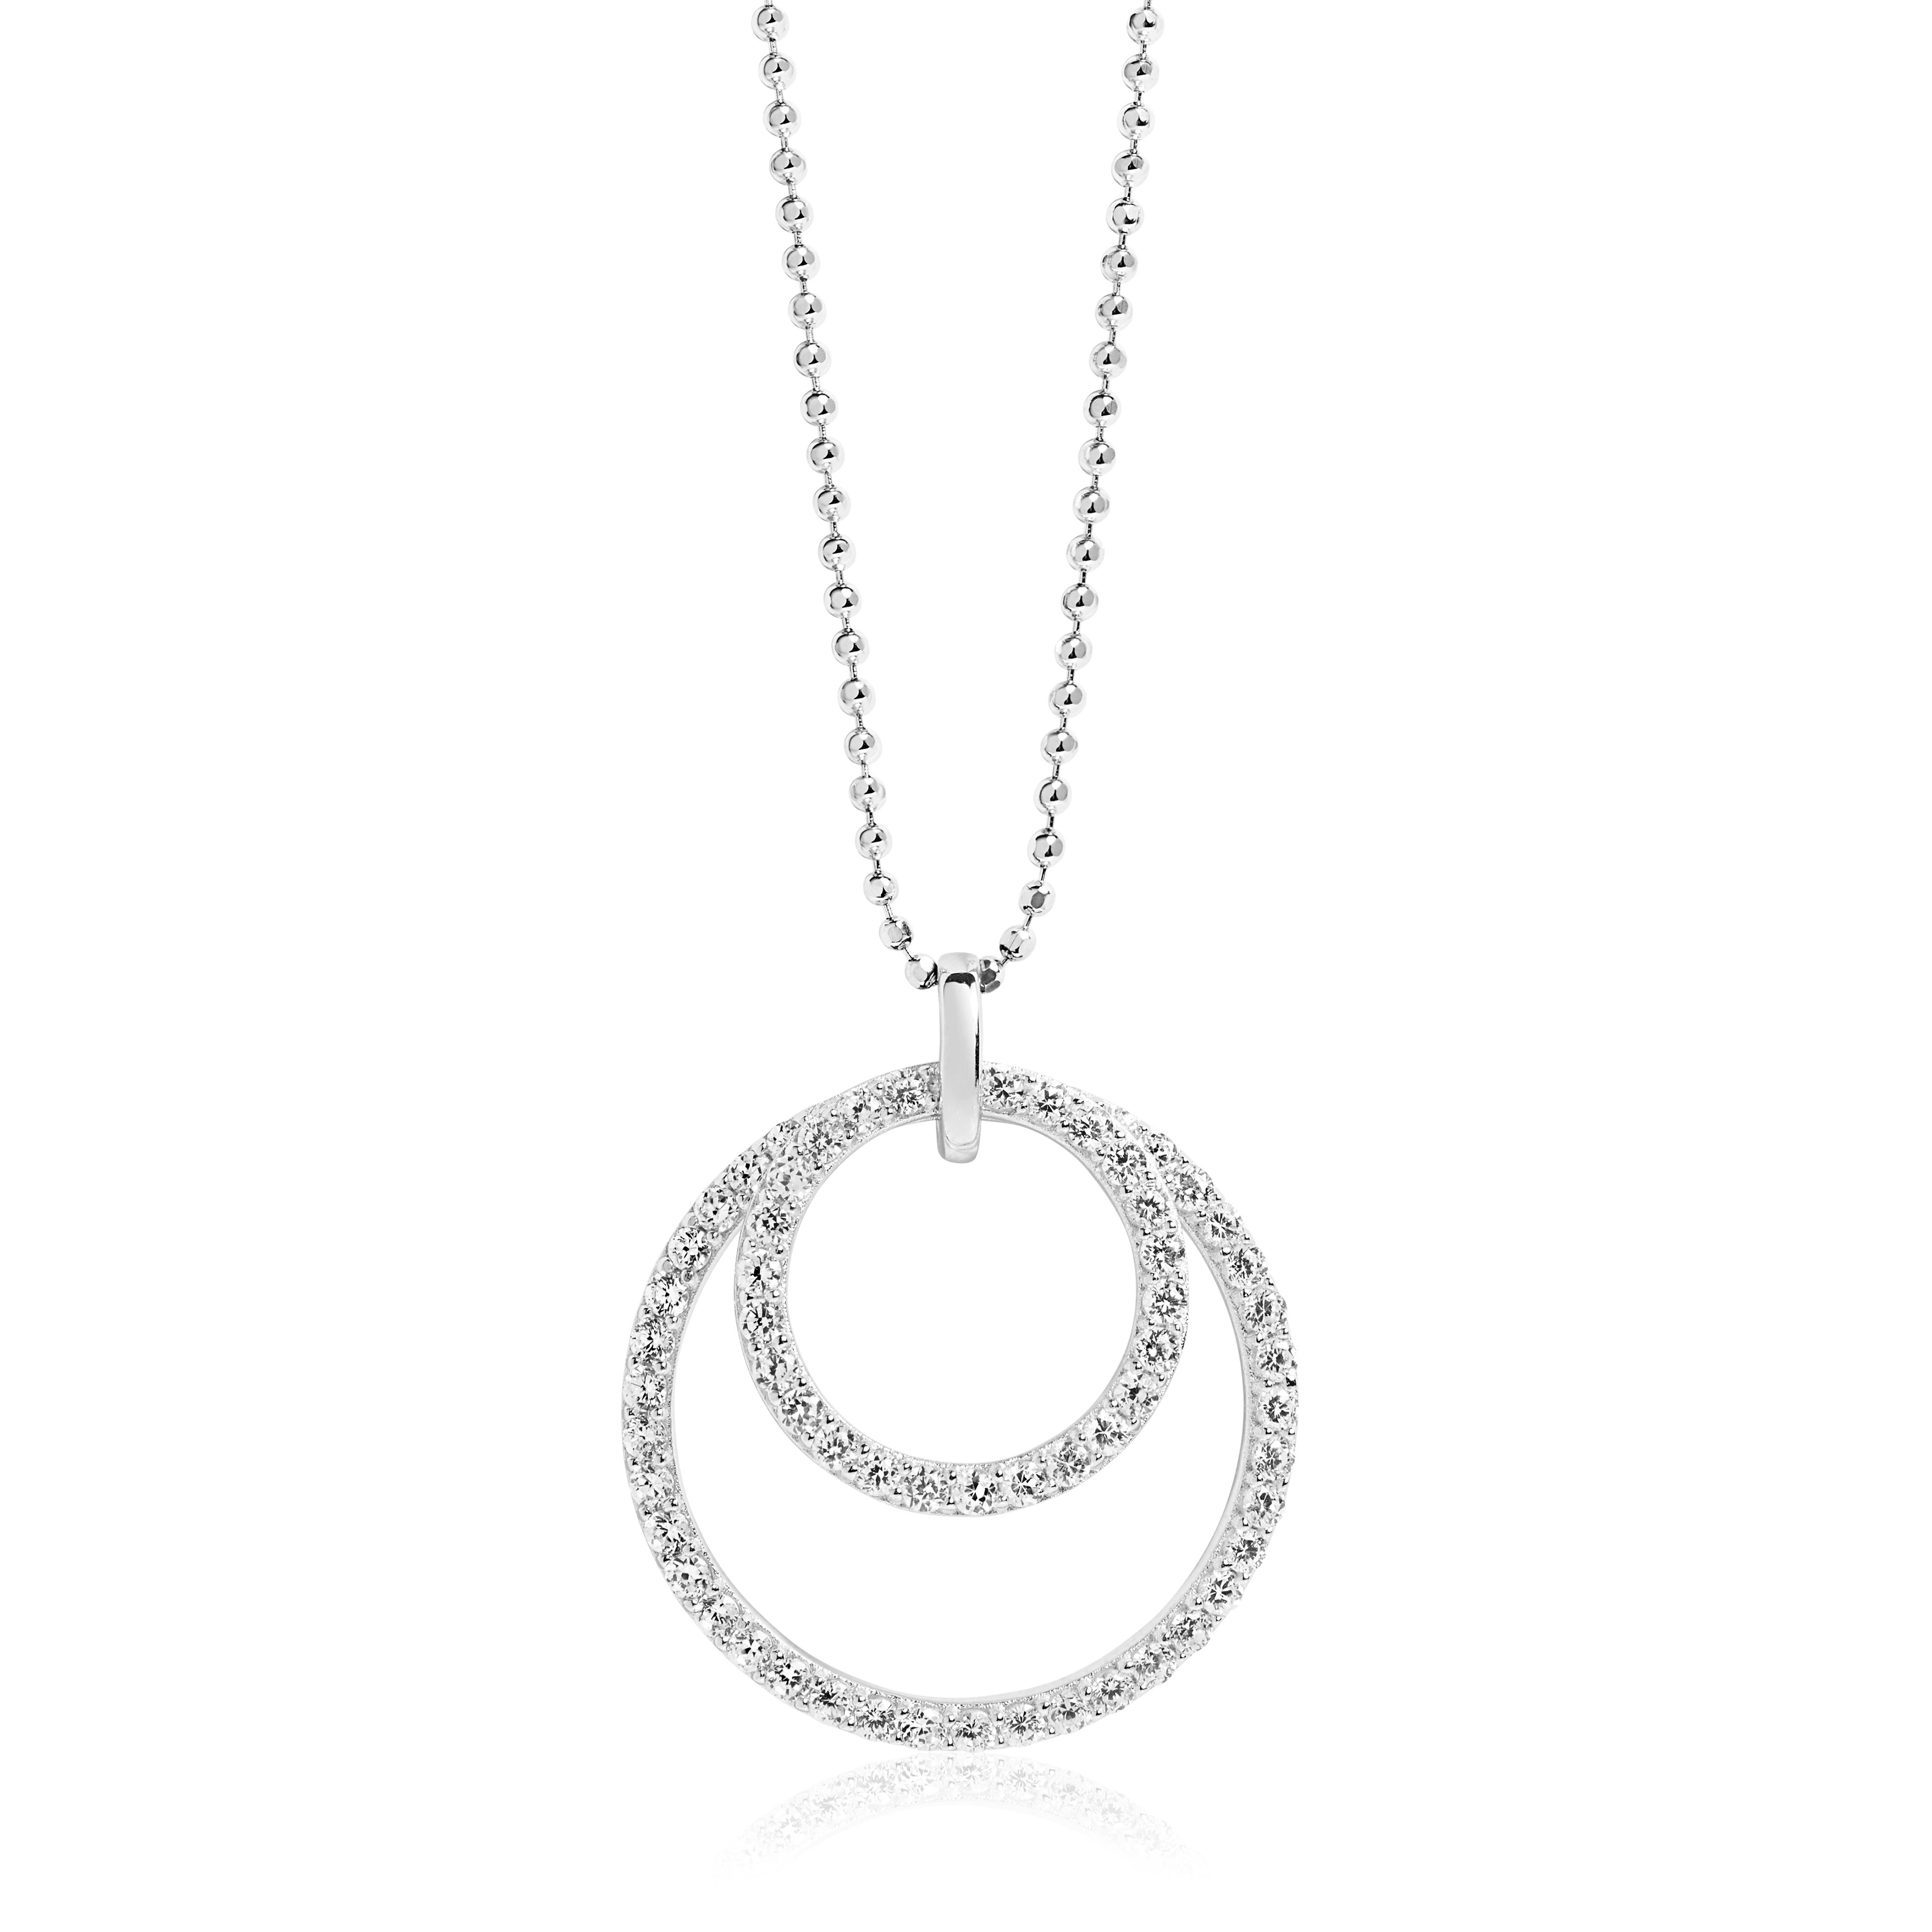 Sif Jakobs Jewellery Halskette VALENZA DUE | Schmuck > Halsketten > Lange Ketten | Sif Jakobs Jewellery